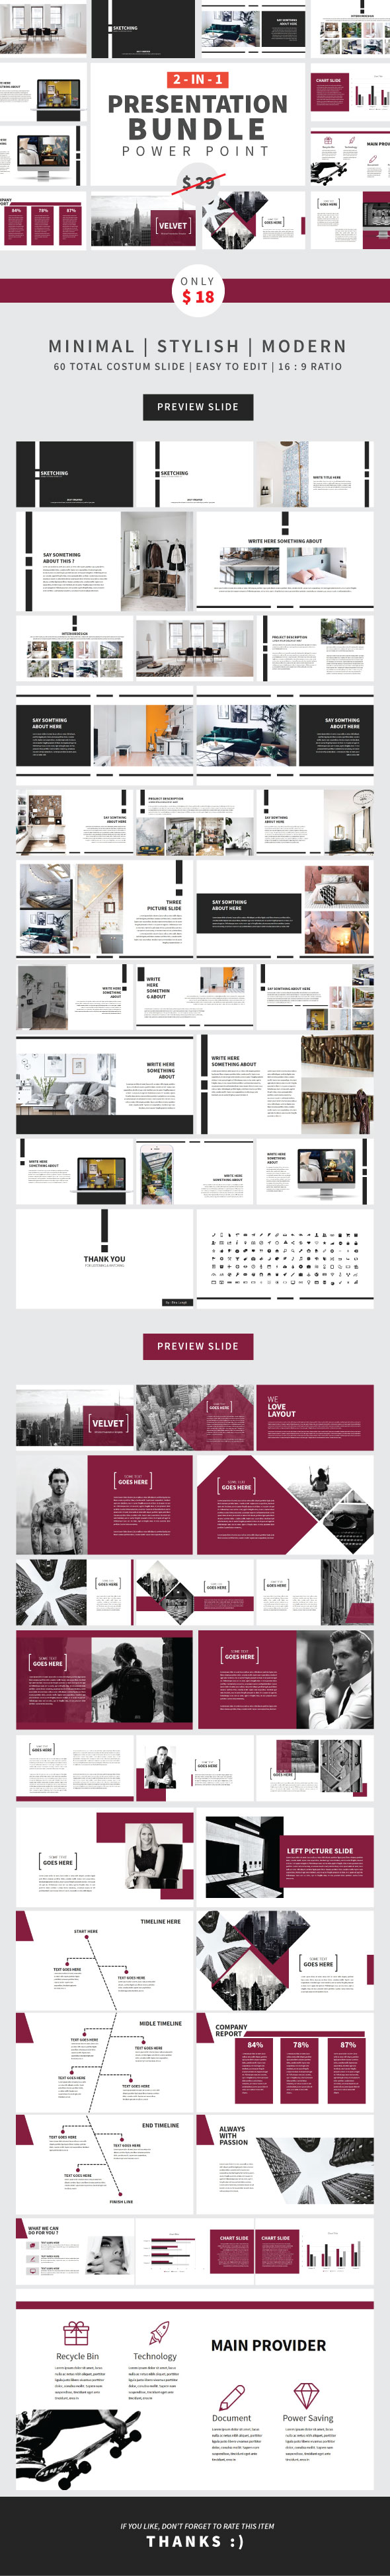 Bundle PPTX 2 in 1 - Creative PowerPoint Templates